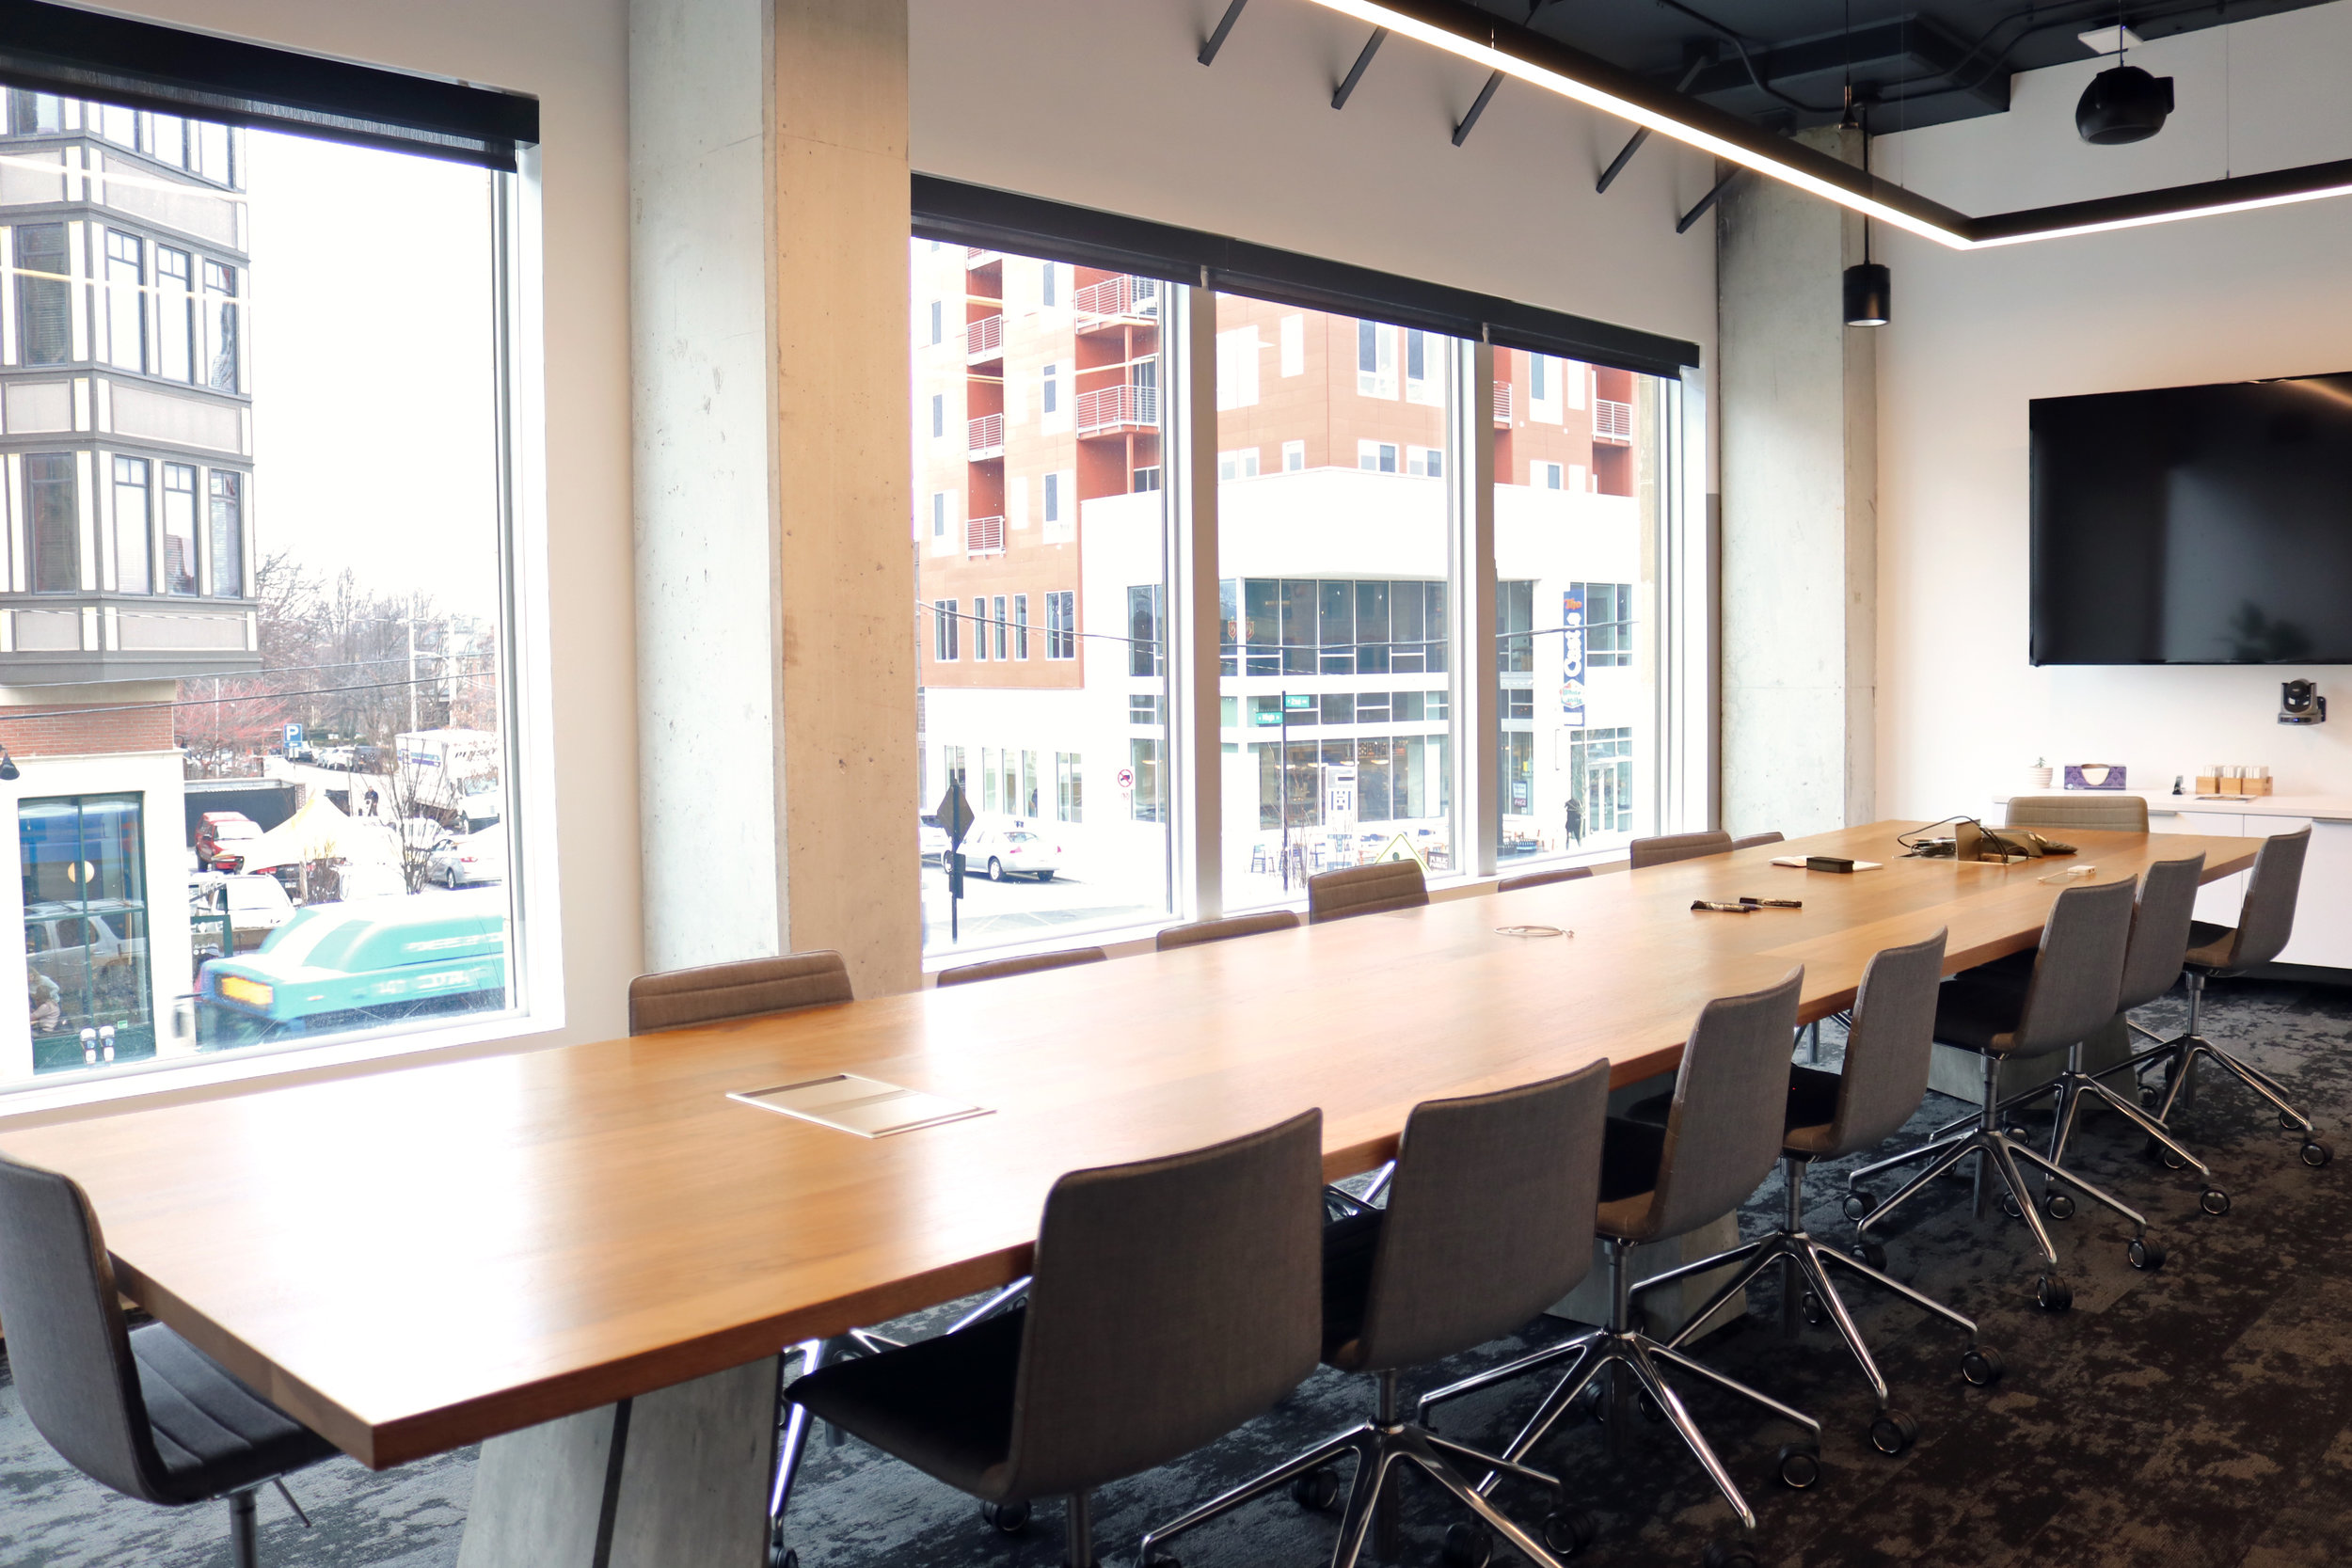 Brunner Building Office Conference Room 2 - Schooley Caldwell.jpg